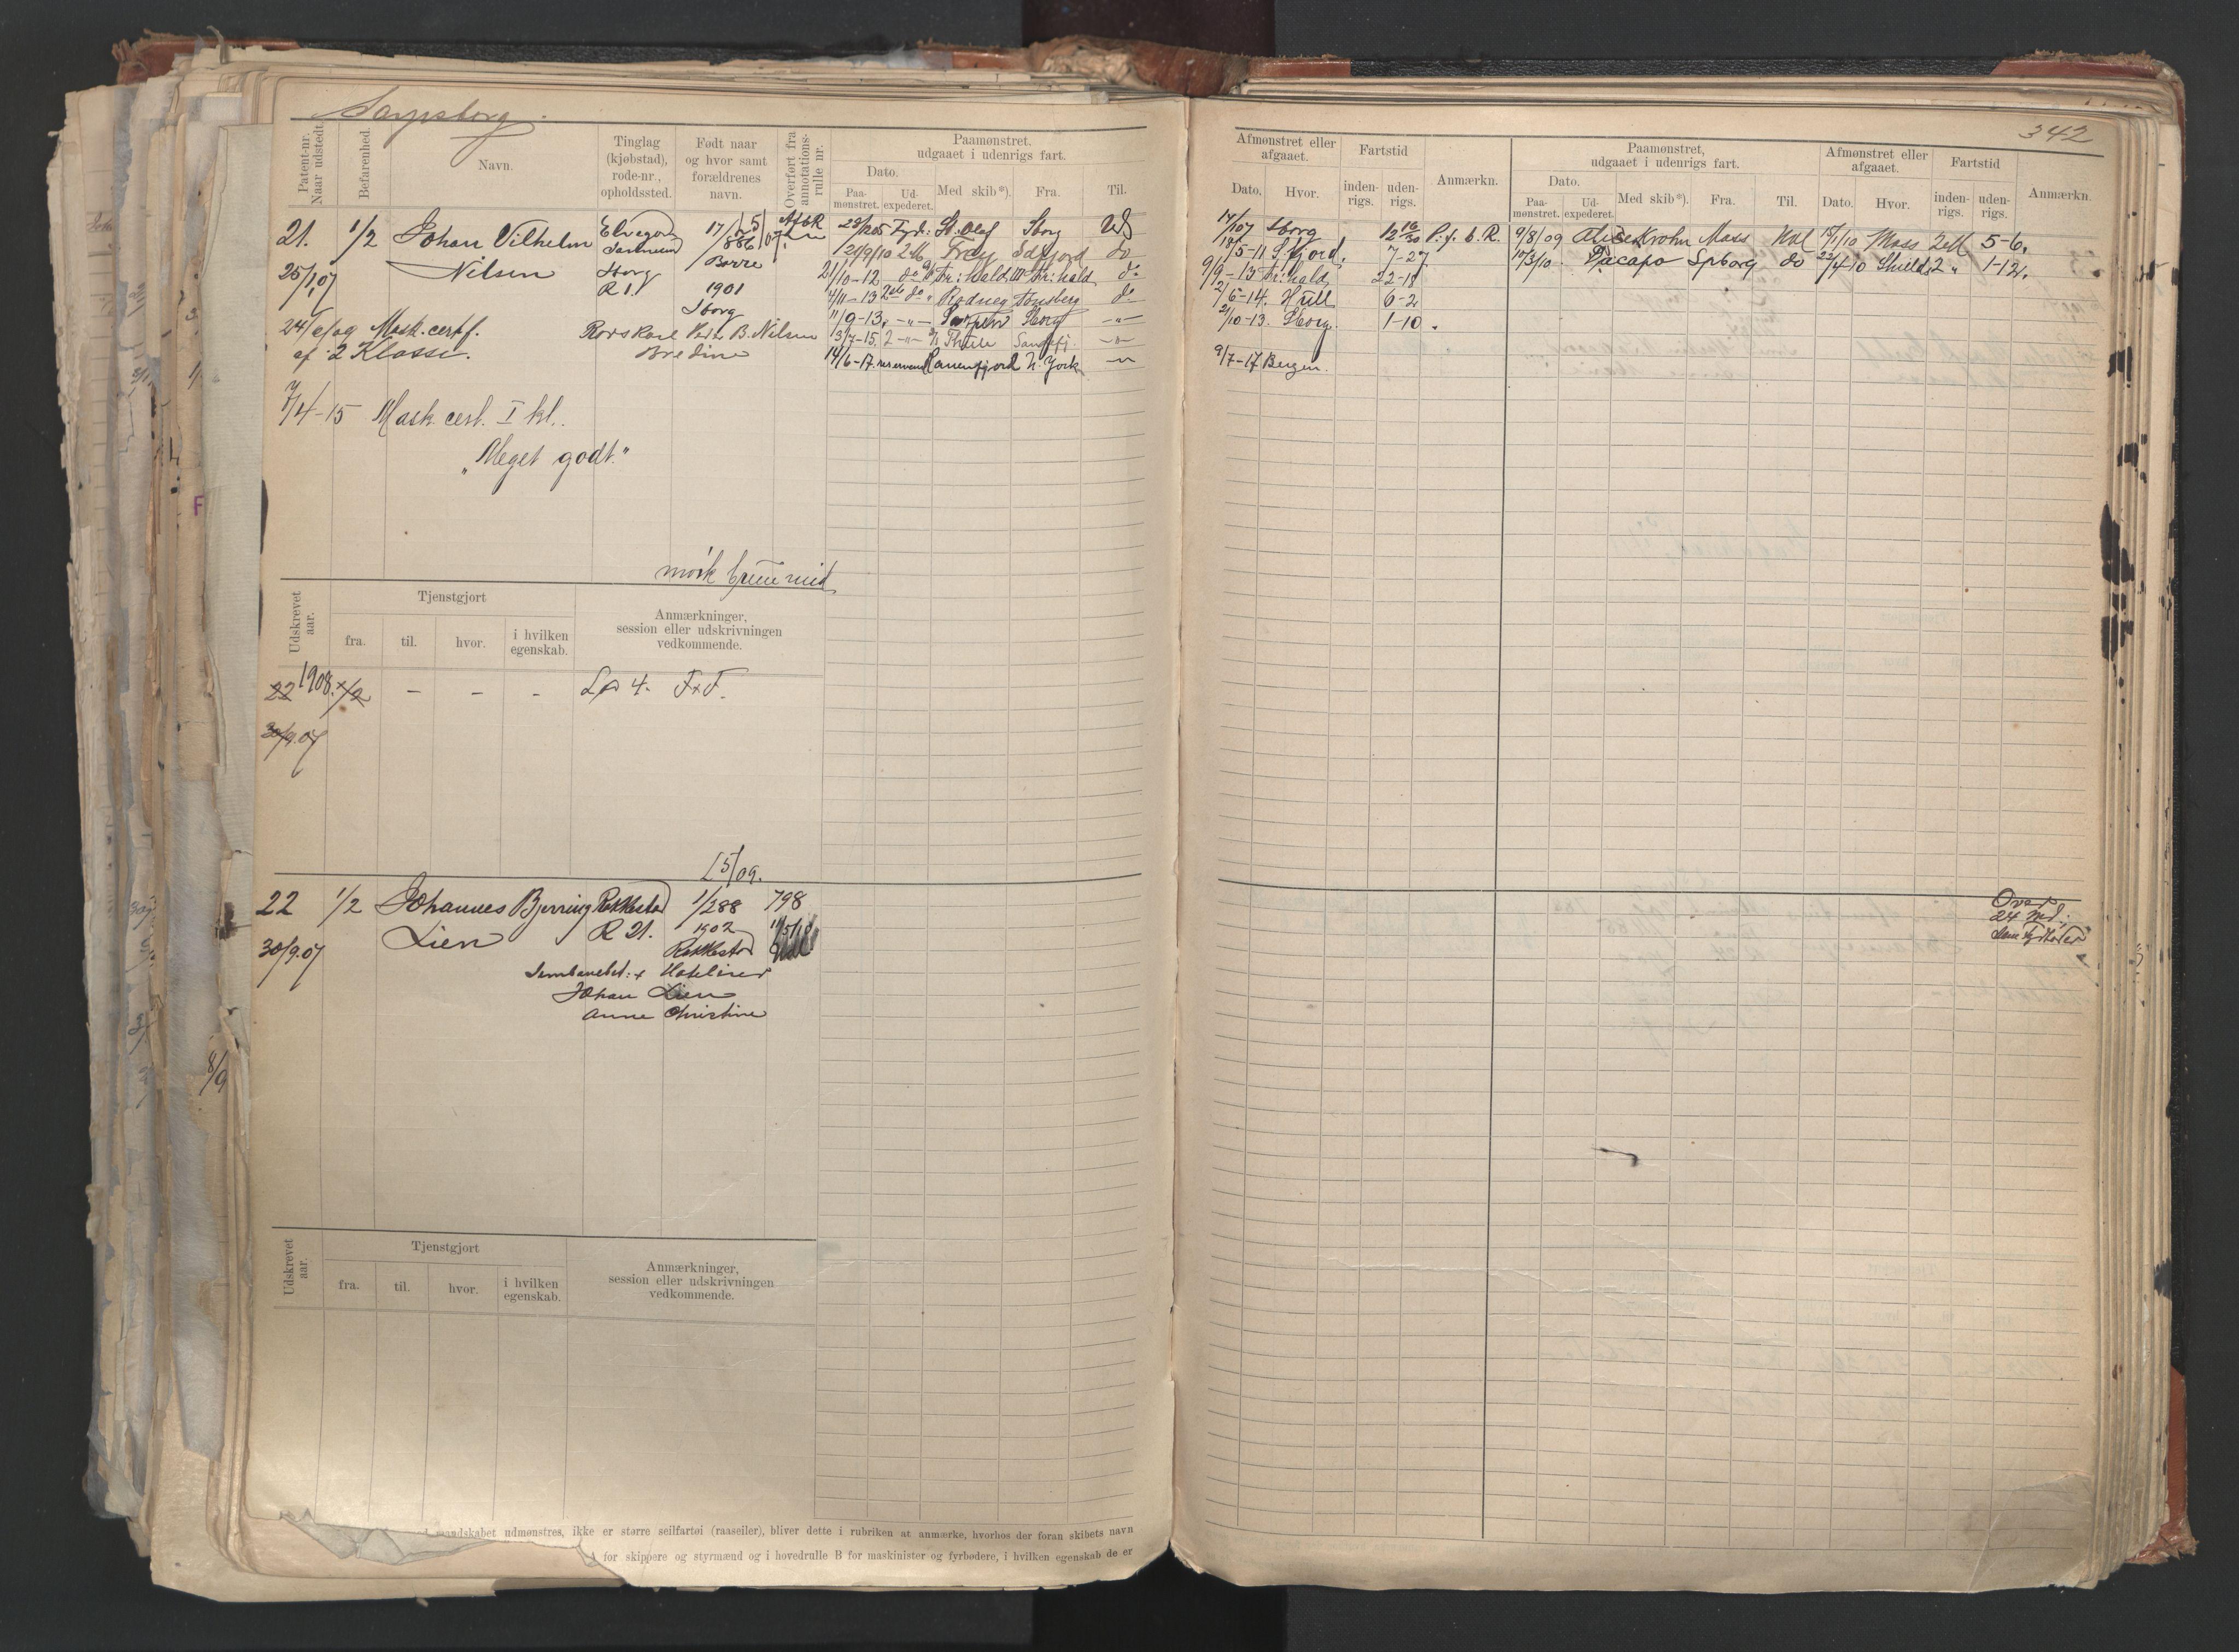 SAO, Oslo sjømannskontor, F/Fd/L0006: B-rulle, 1883, s. 341b-342a